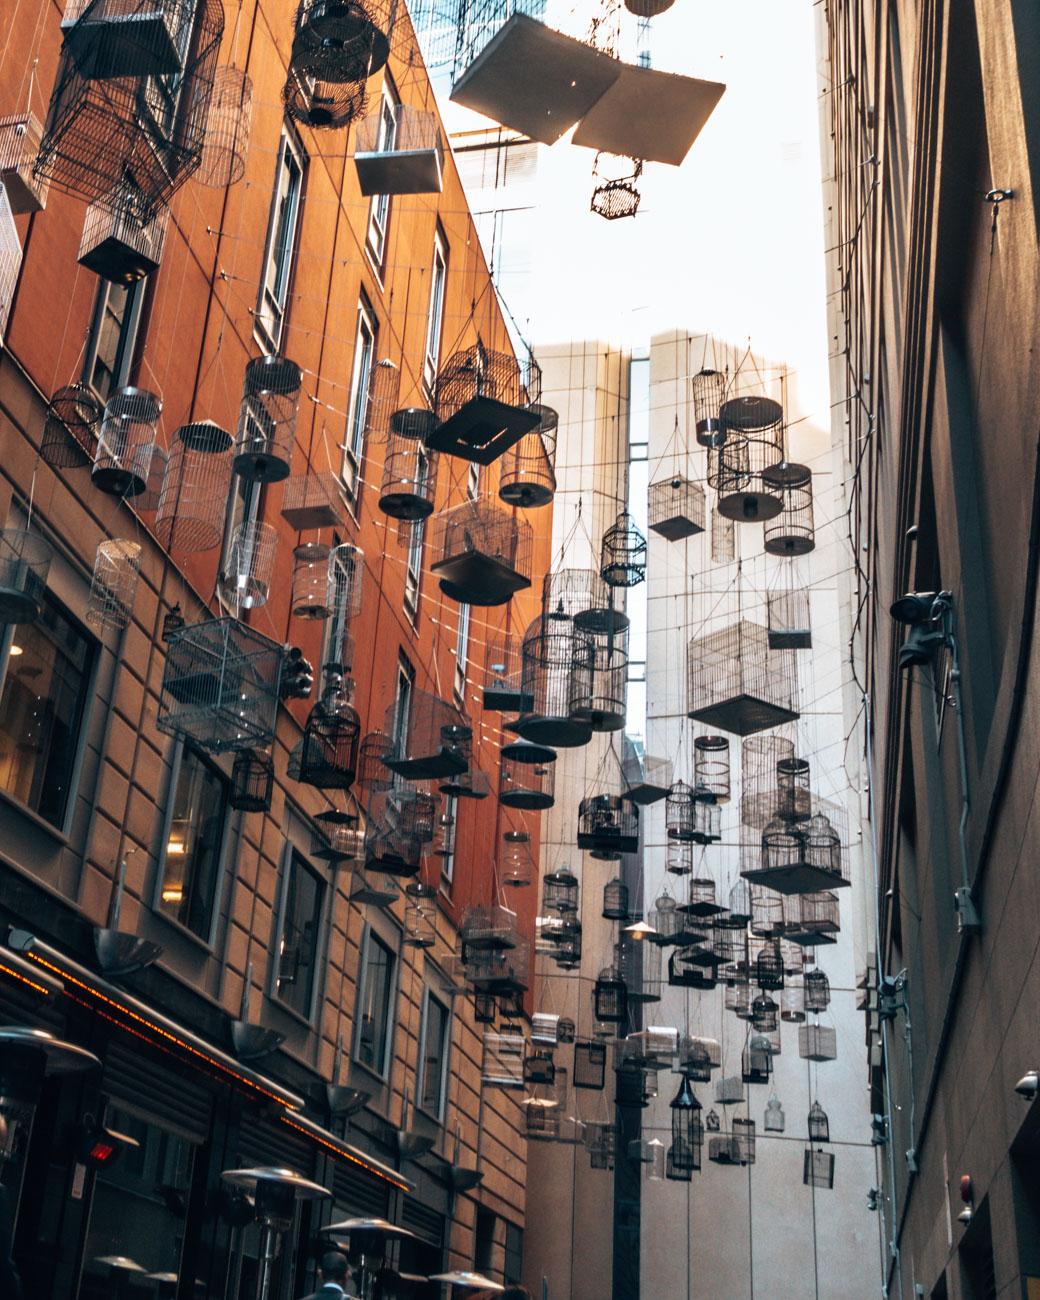 sydney bezoeken in australie wereldreis plannen